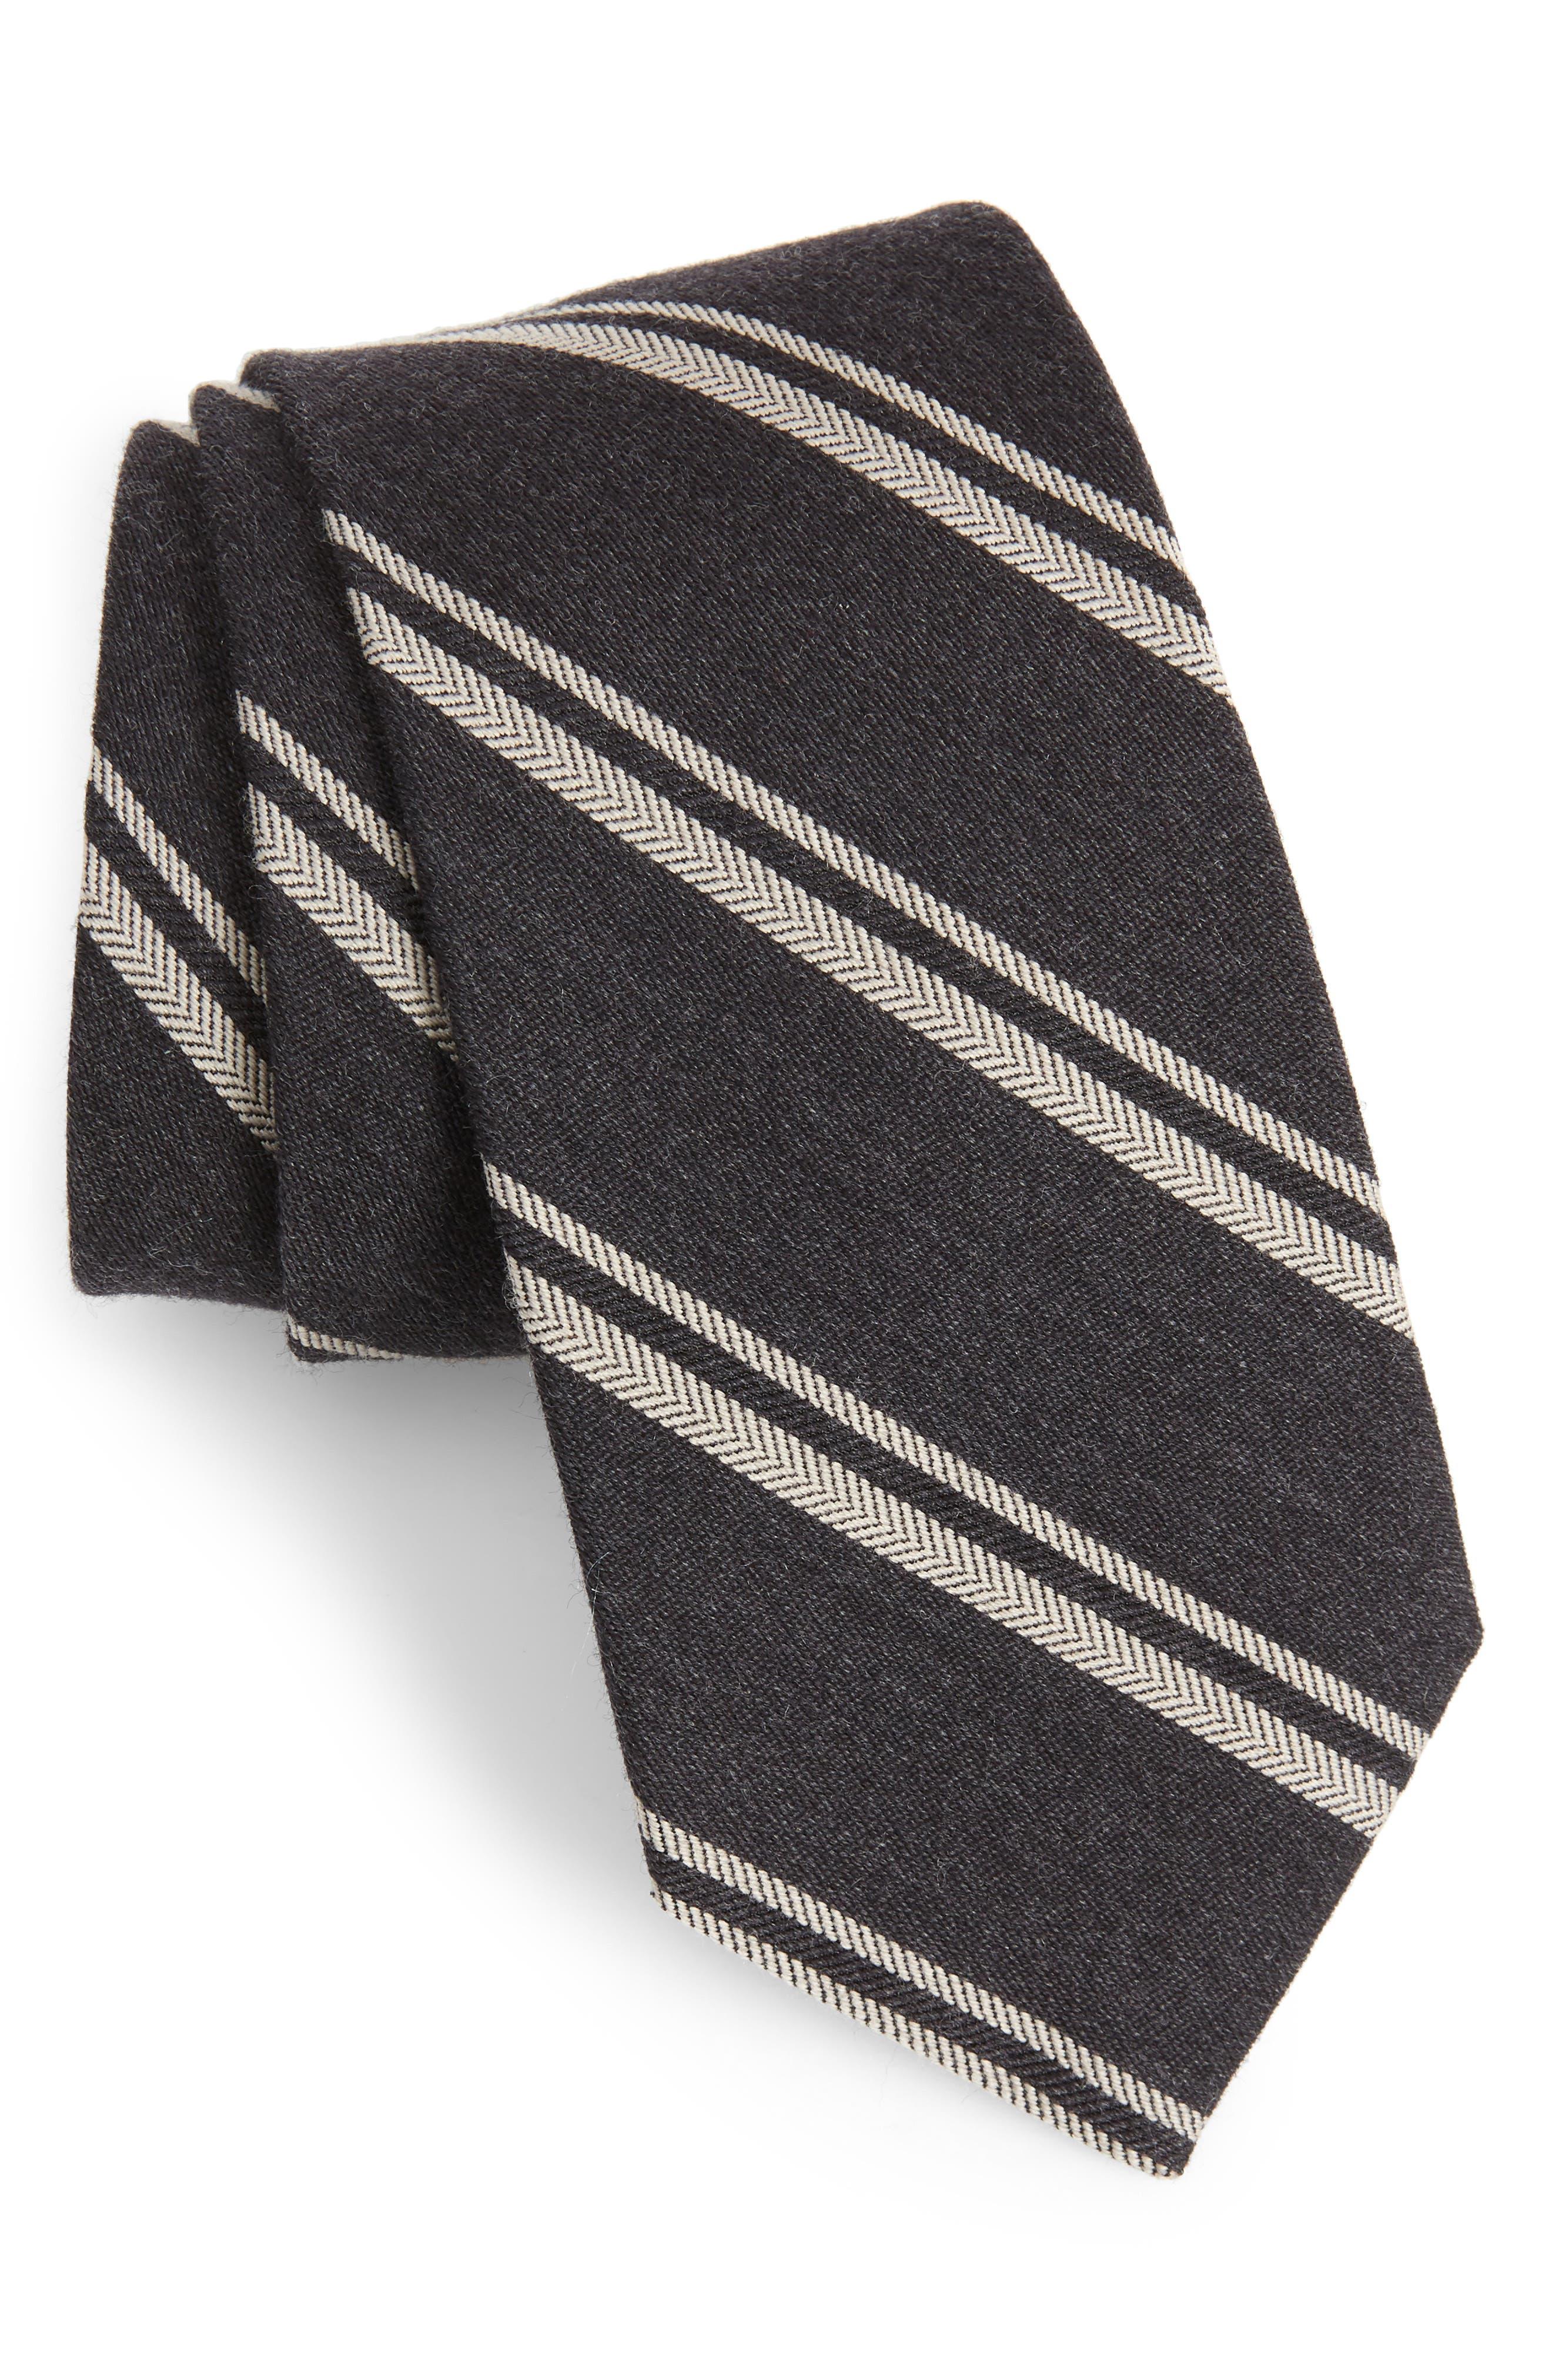 Dornach Stripe Wool & Silk Tie,                             Main thumbnail 1, color,                             BLACK PEPPER STRIPE